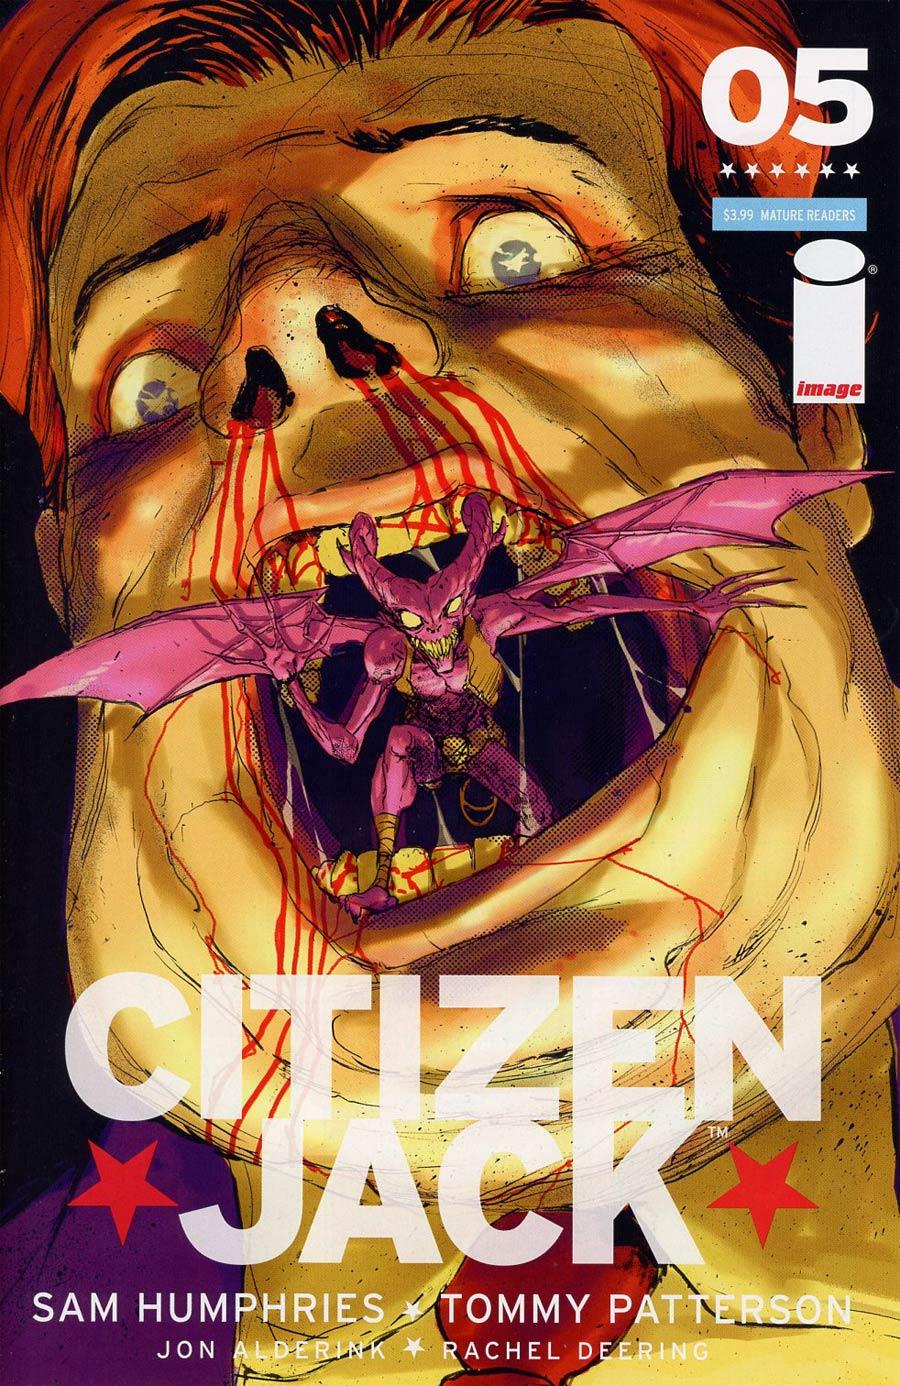 Citizen Jack #5 Cover B Riley Rossmo